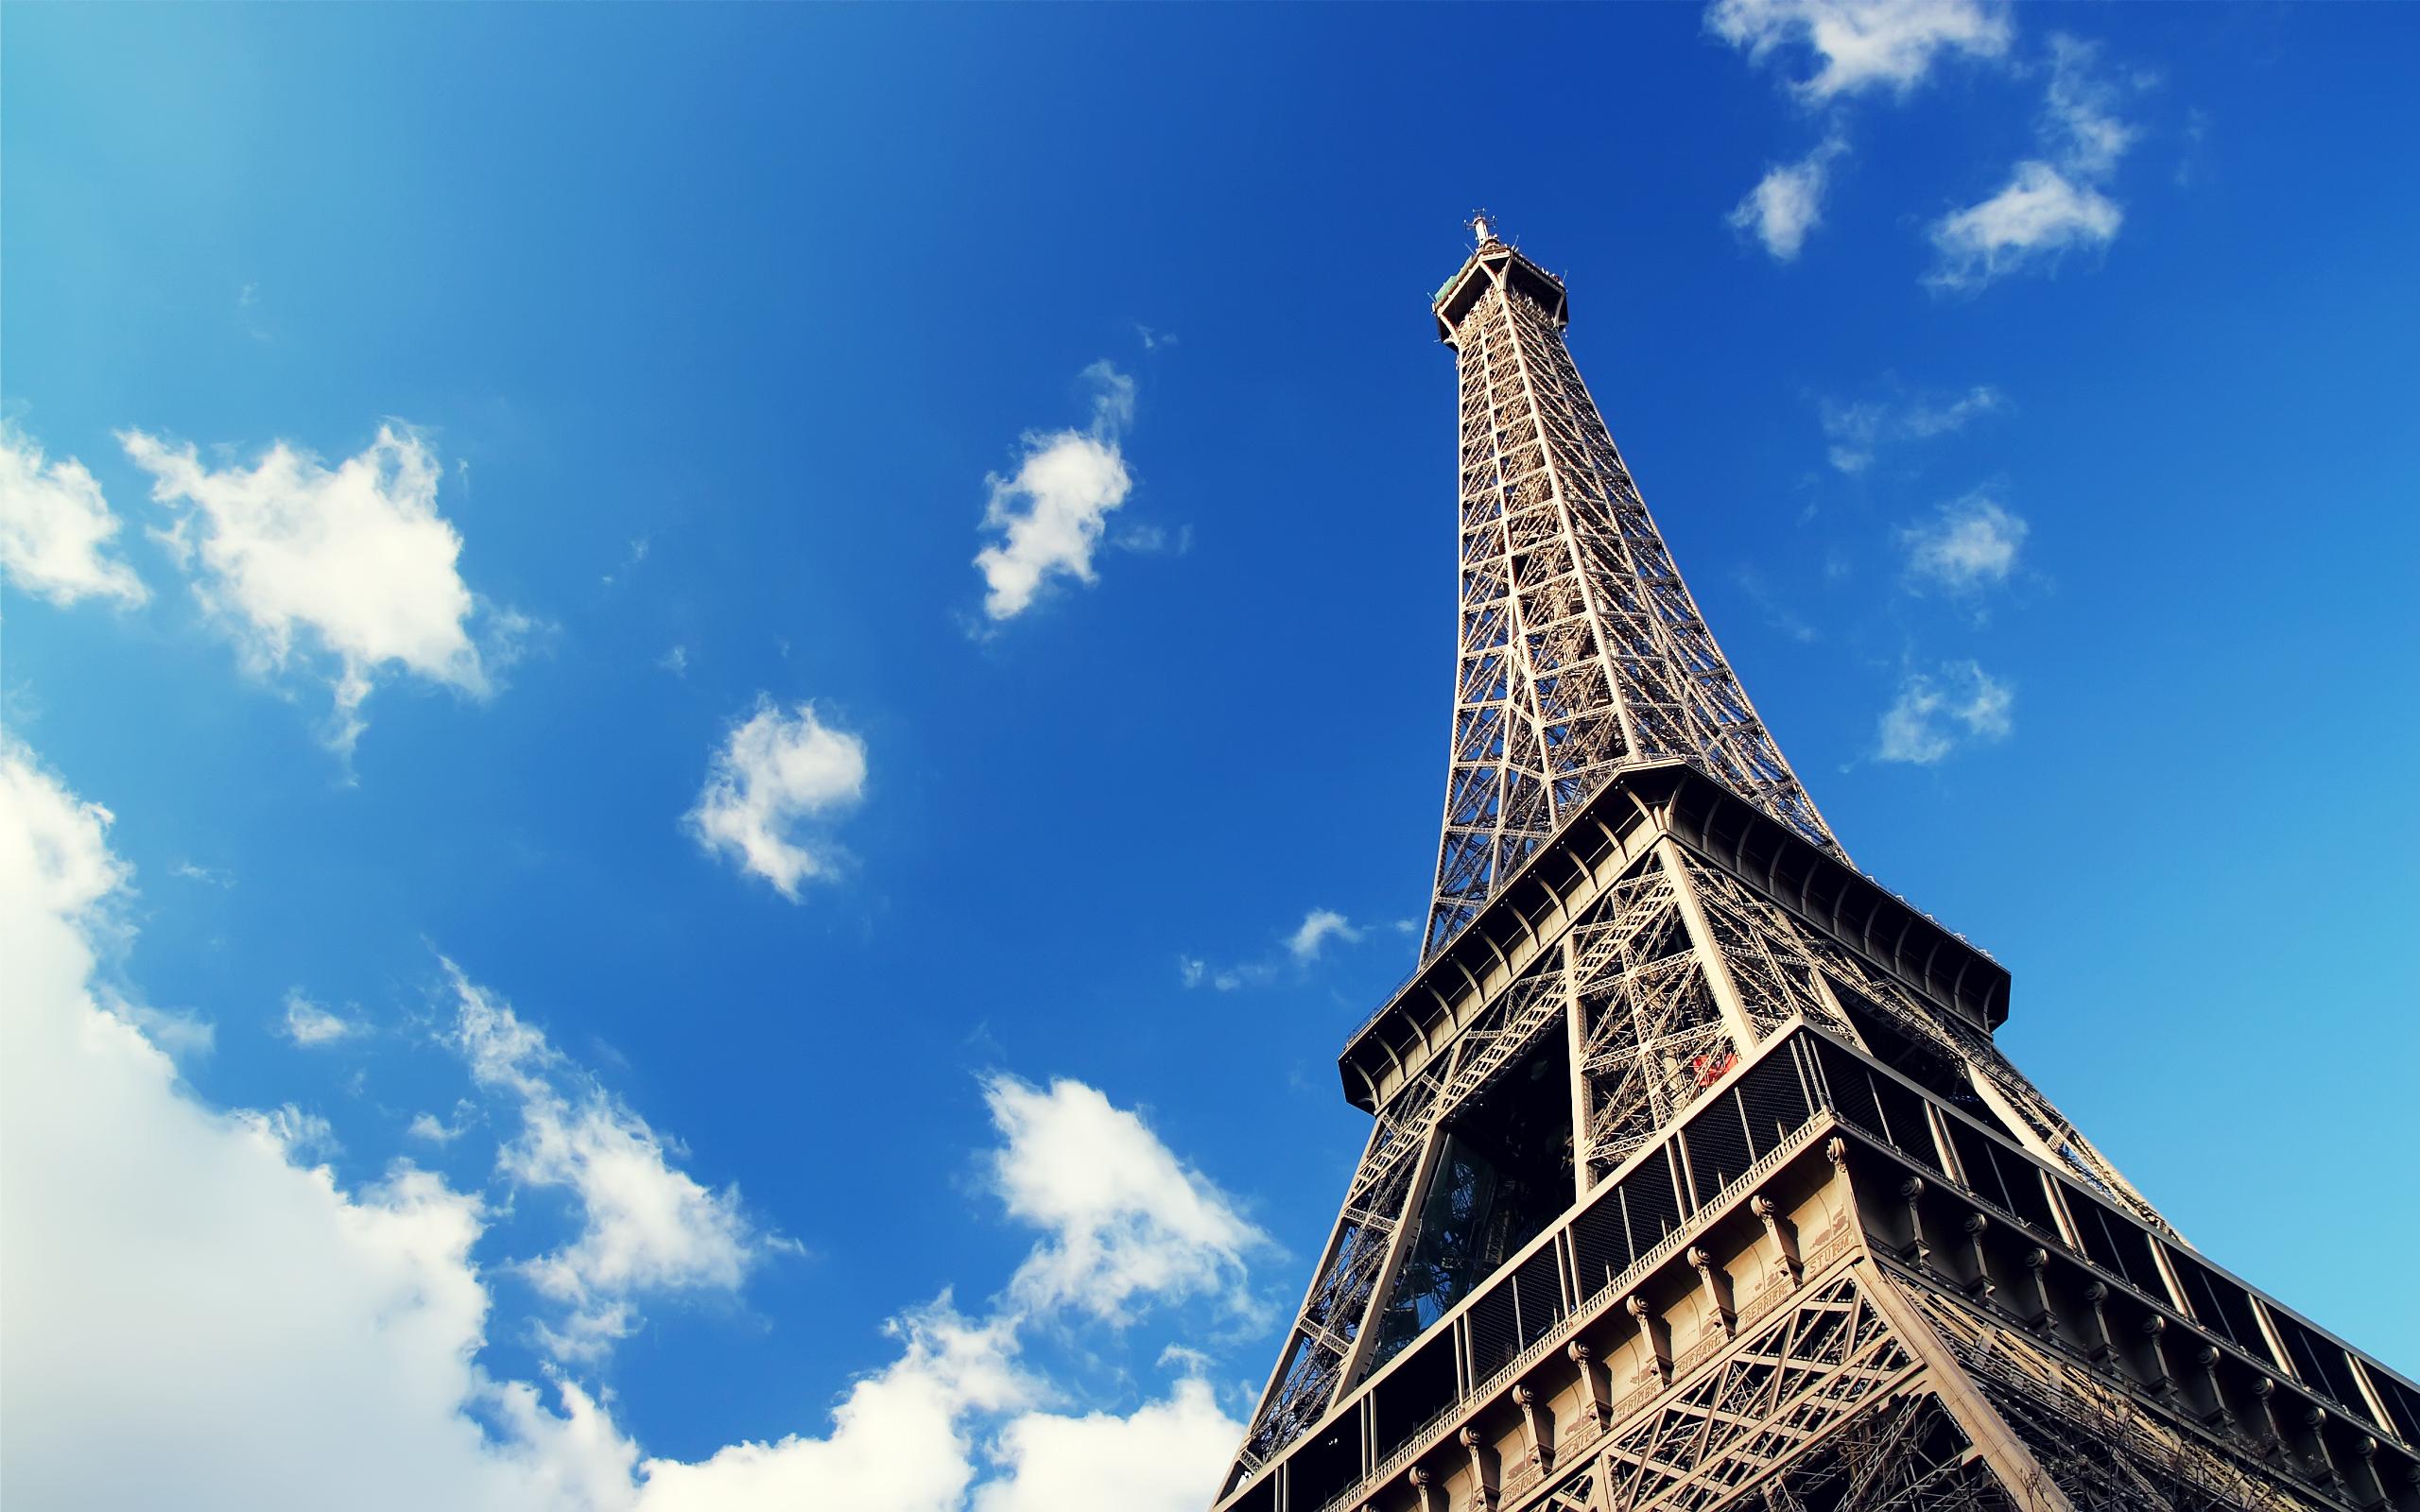 Eiffel Tower HD Wallpaper   Background Image   2560x1600   ID:598332 - Wallpaper Abyss